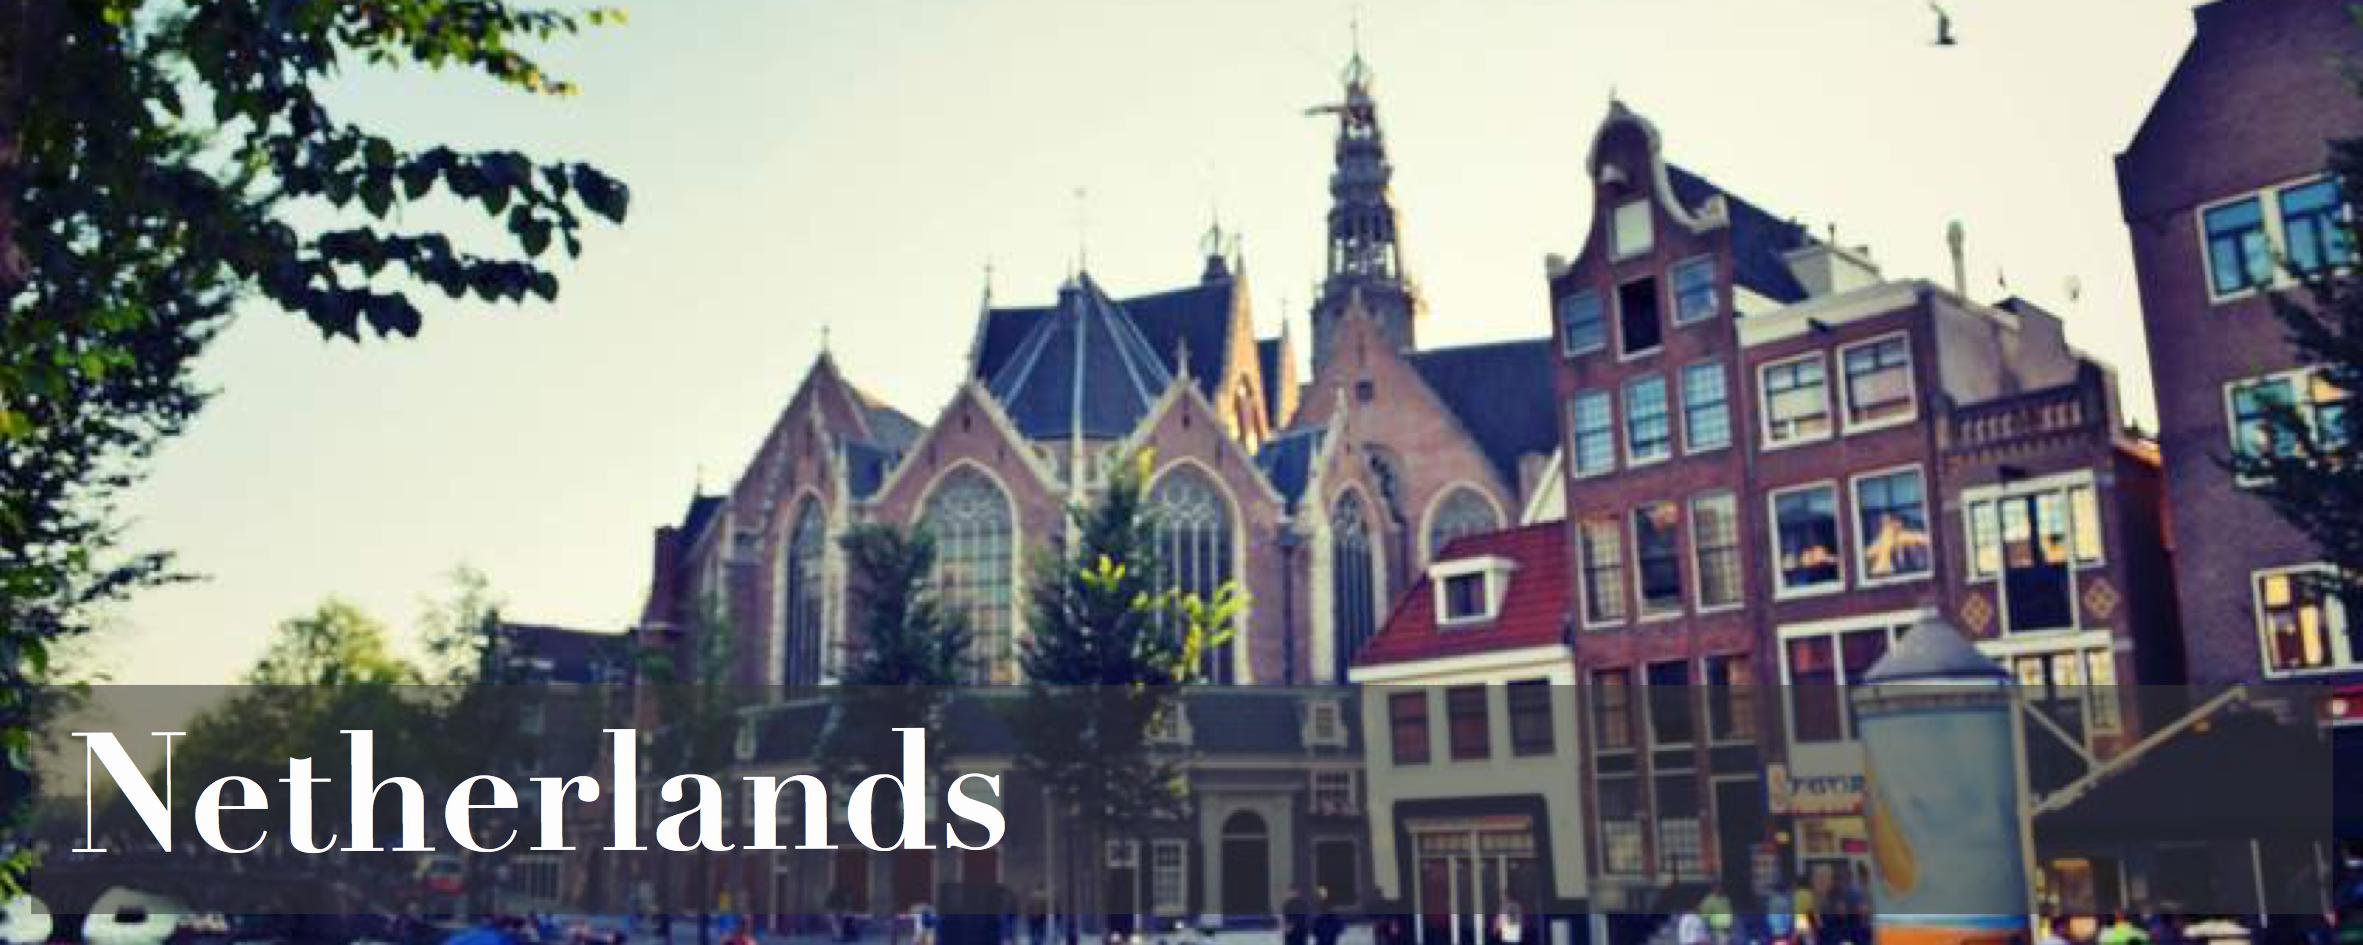 europe - netherlands